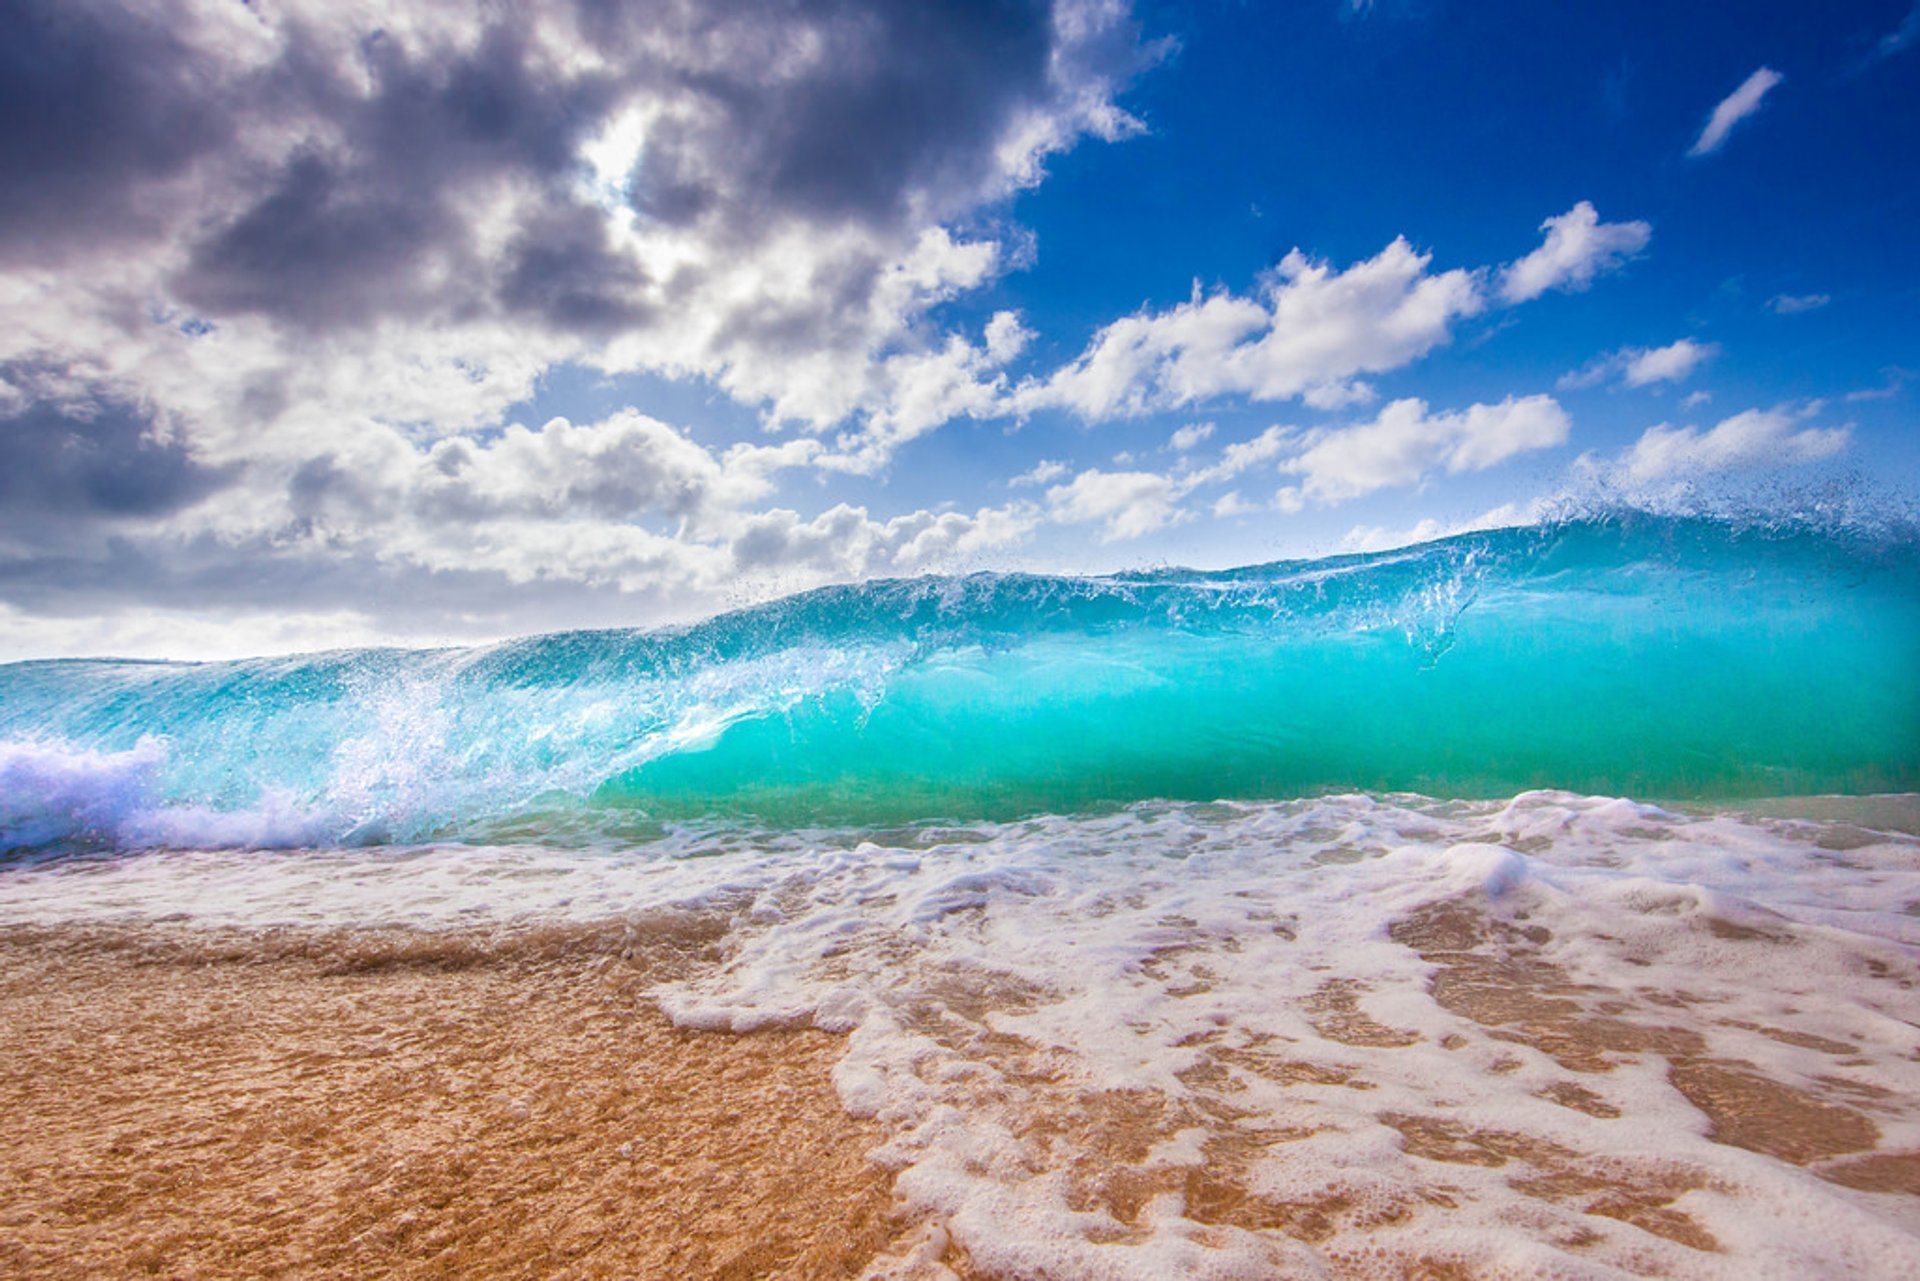 Beach Season in Hawaii - Best Season 2019